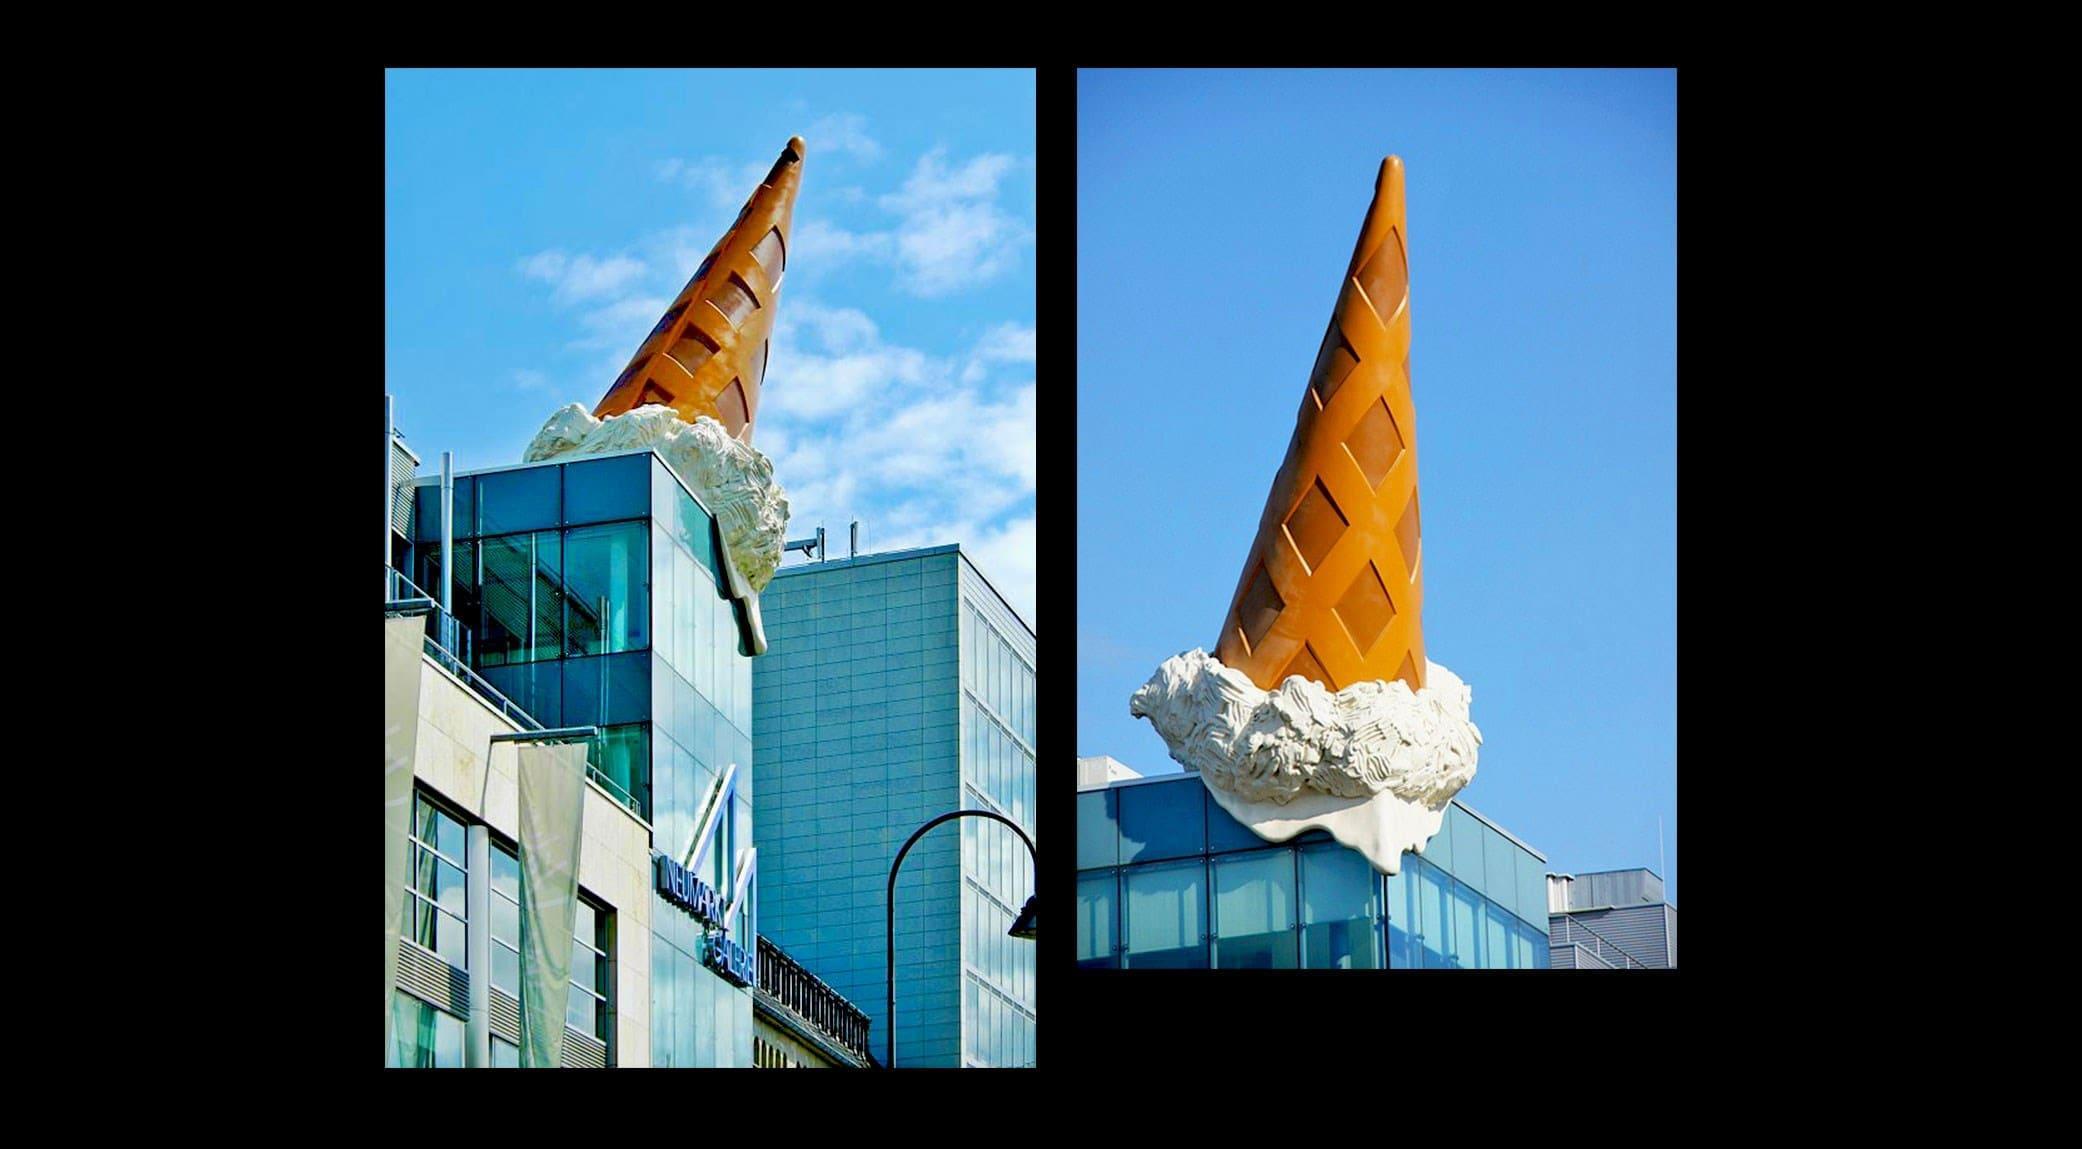 original_002-dropped-cone-finedininglovers.jpg